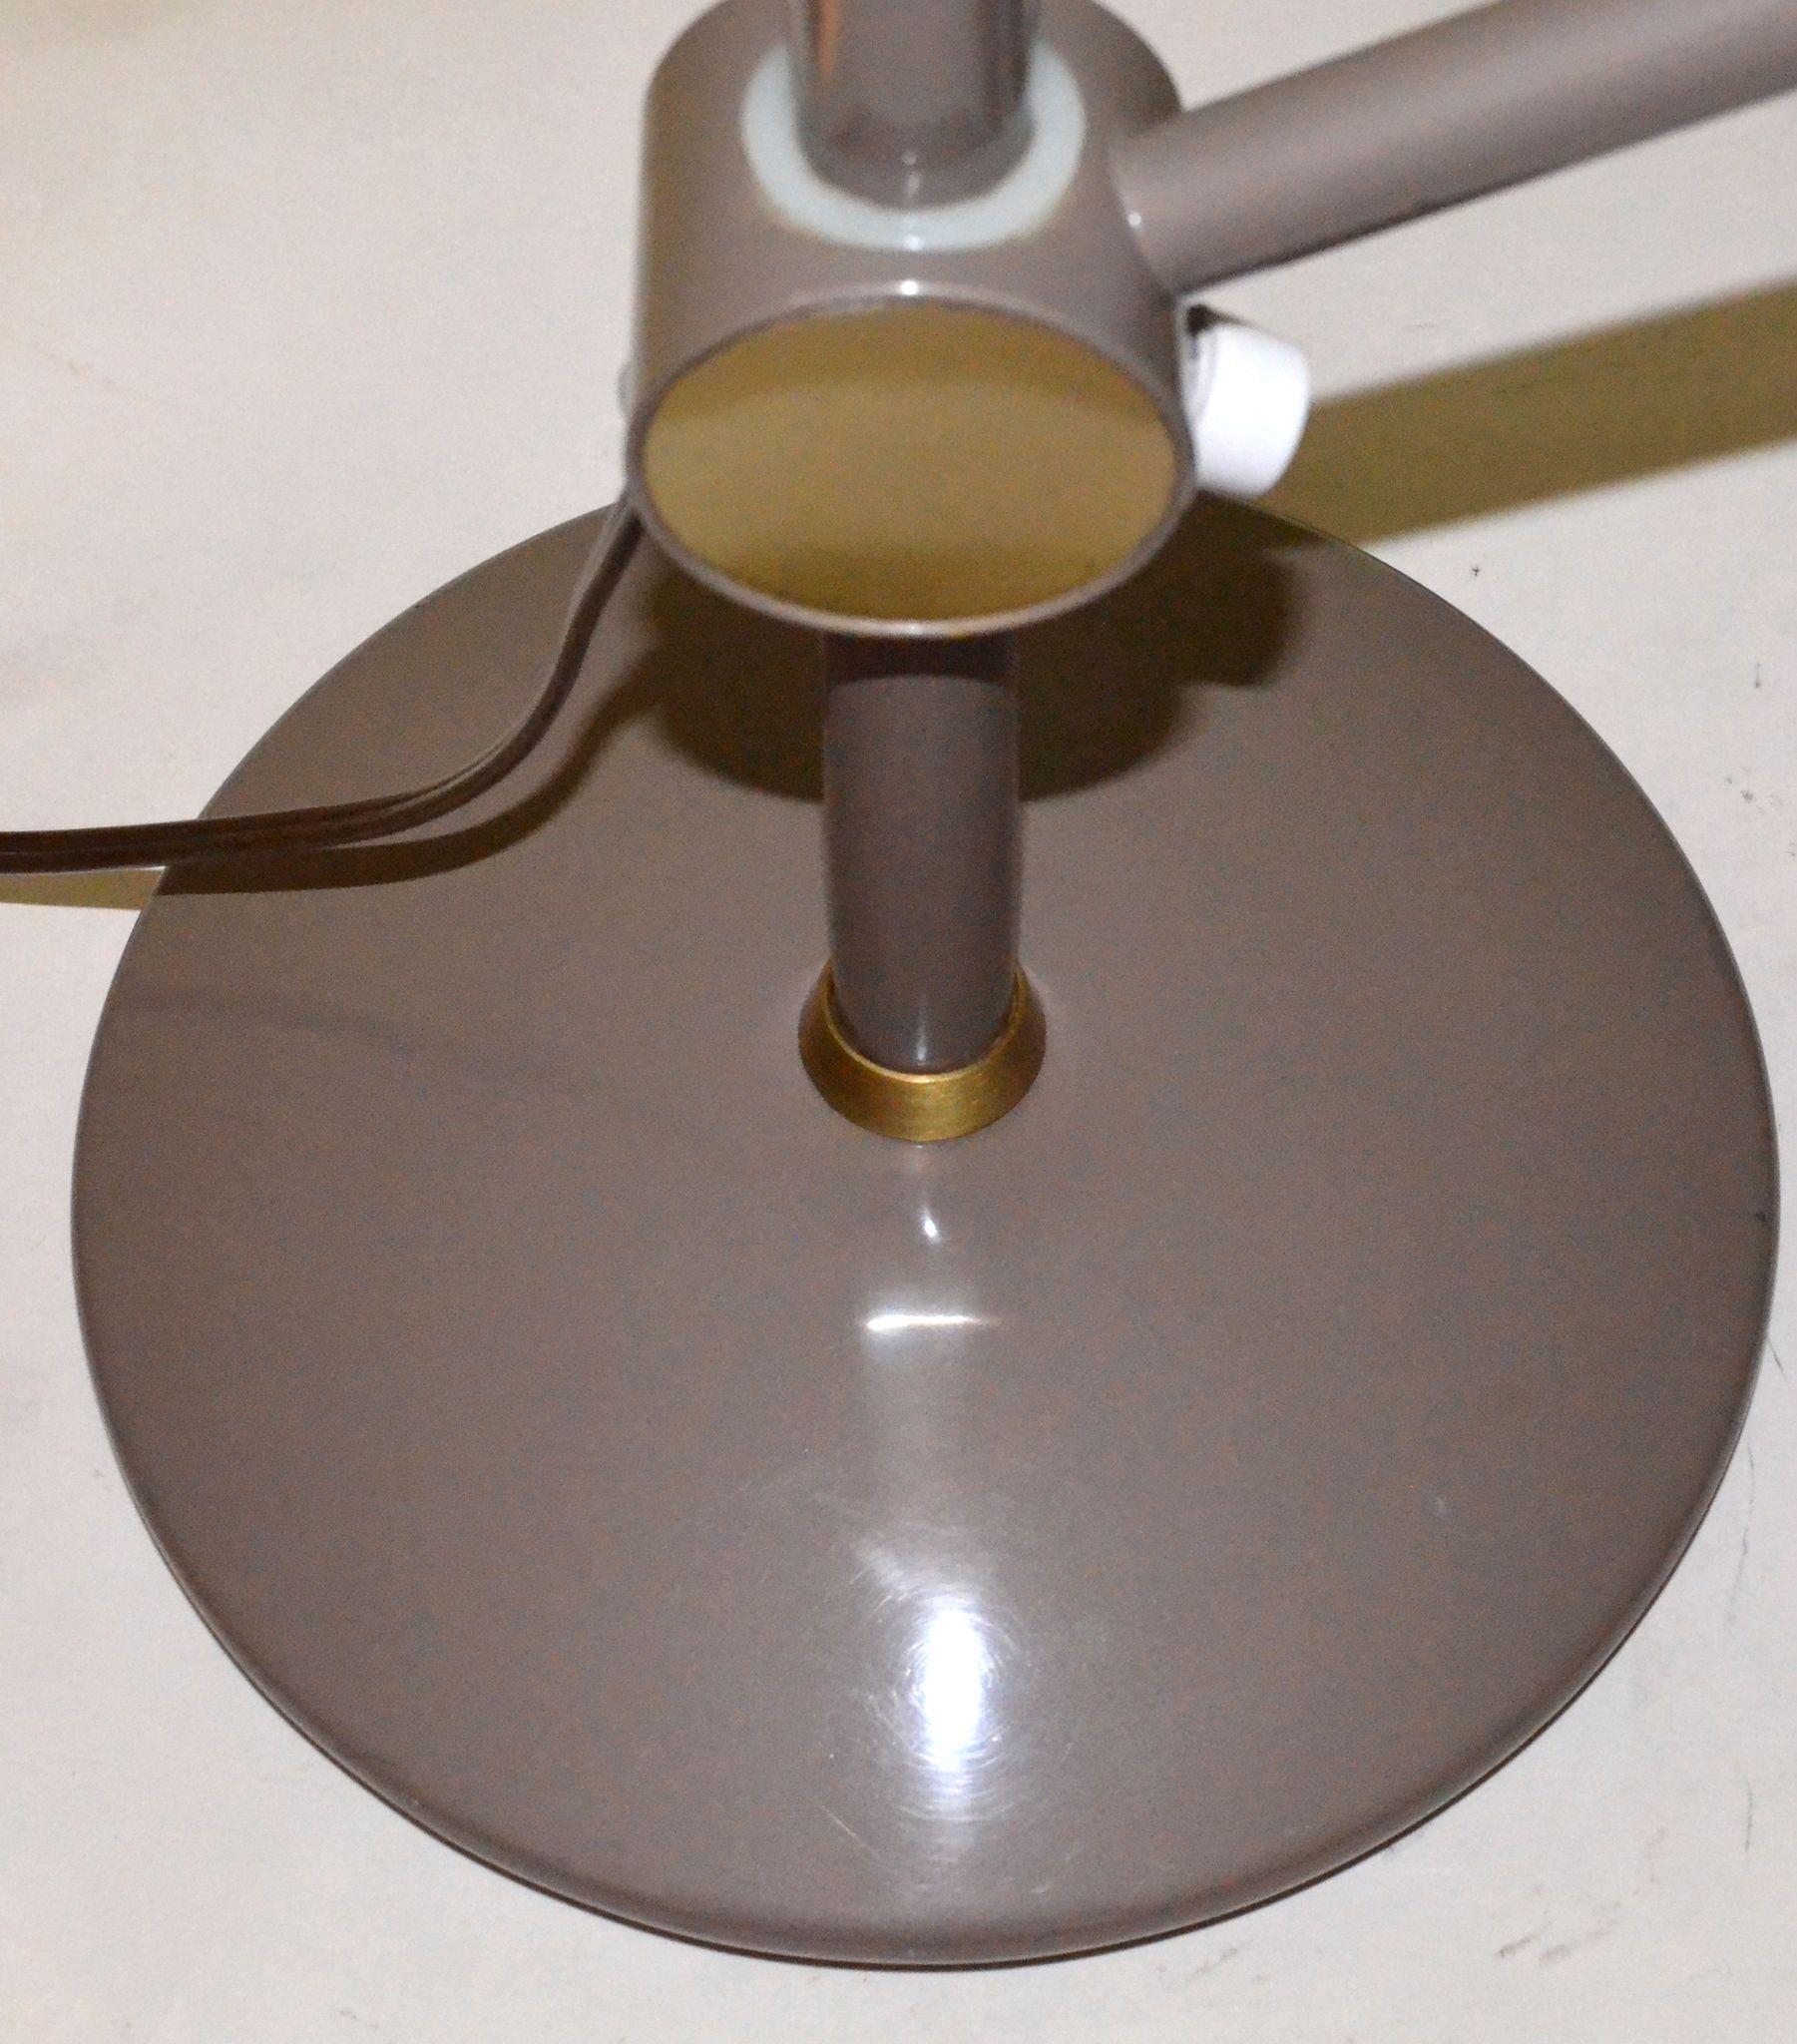 Dazor Model 2008 Mid Century Modern Desk Lamp From